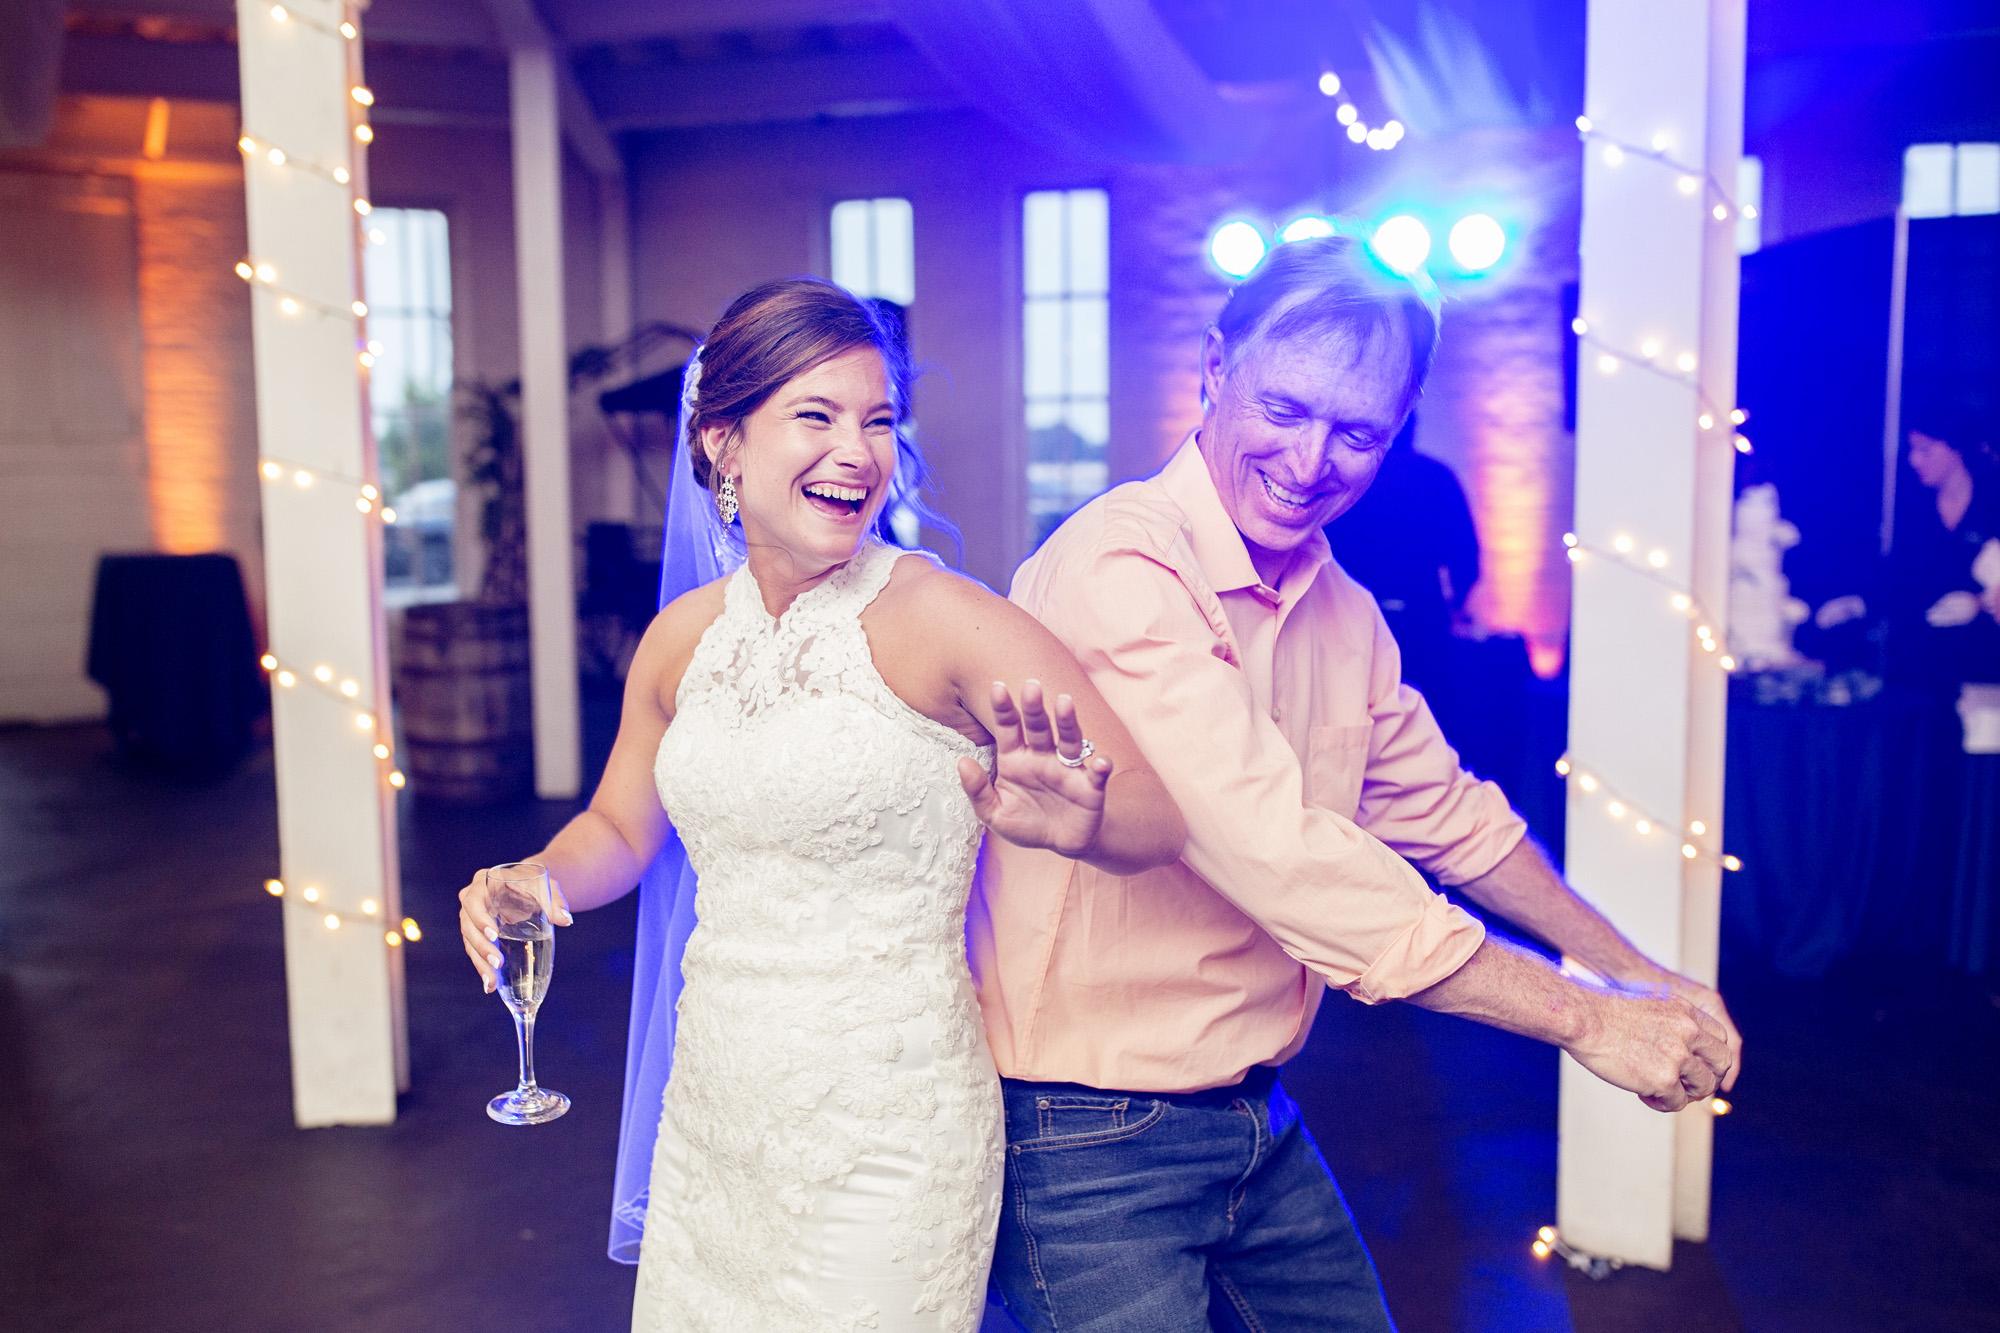 Seriously_Sabrina_Photography_Lexington_Kentucky_Round_Barn_Red_Mile_Stable_of_Memories_Wedding_Hart_116.jpg